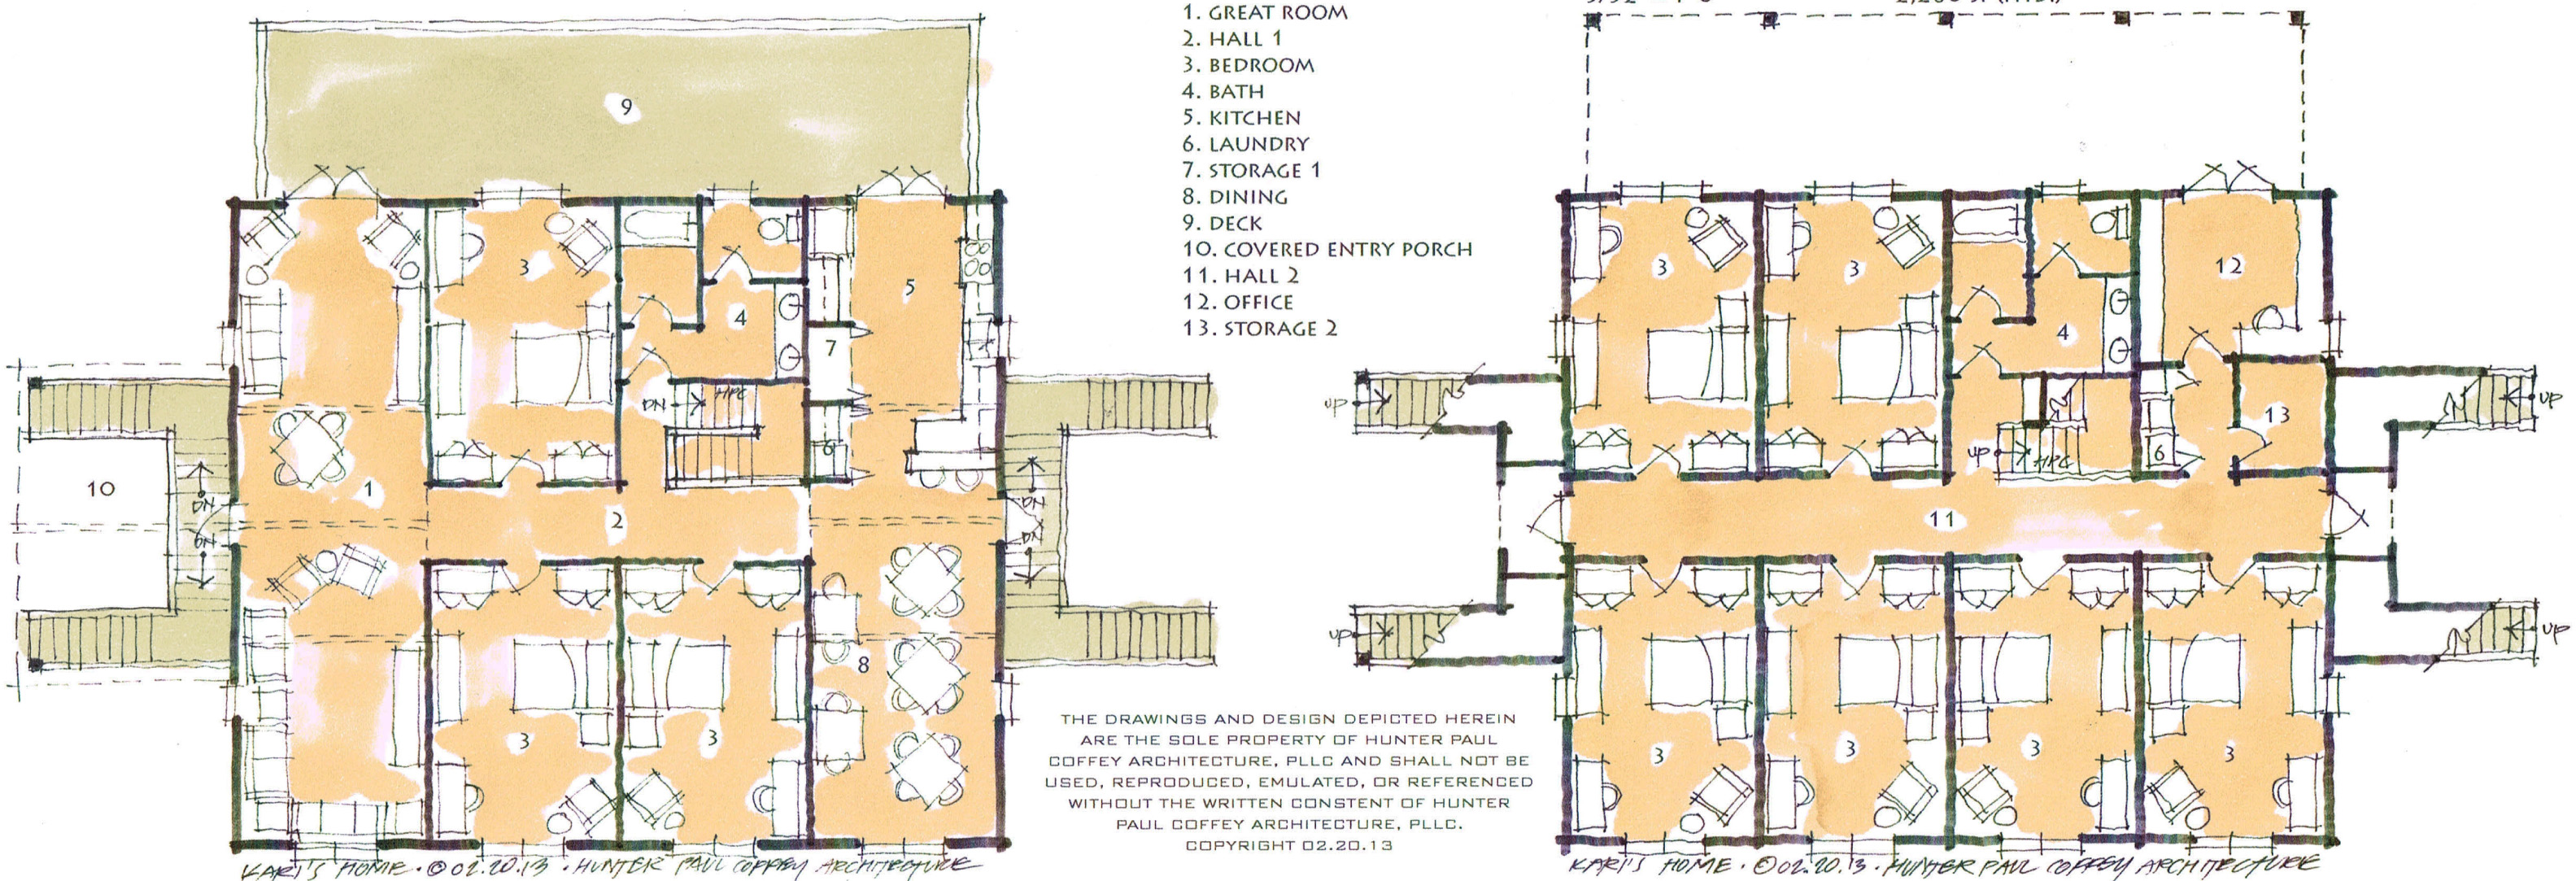 Kari's Home - Plans